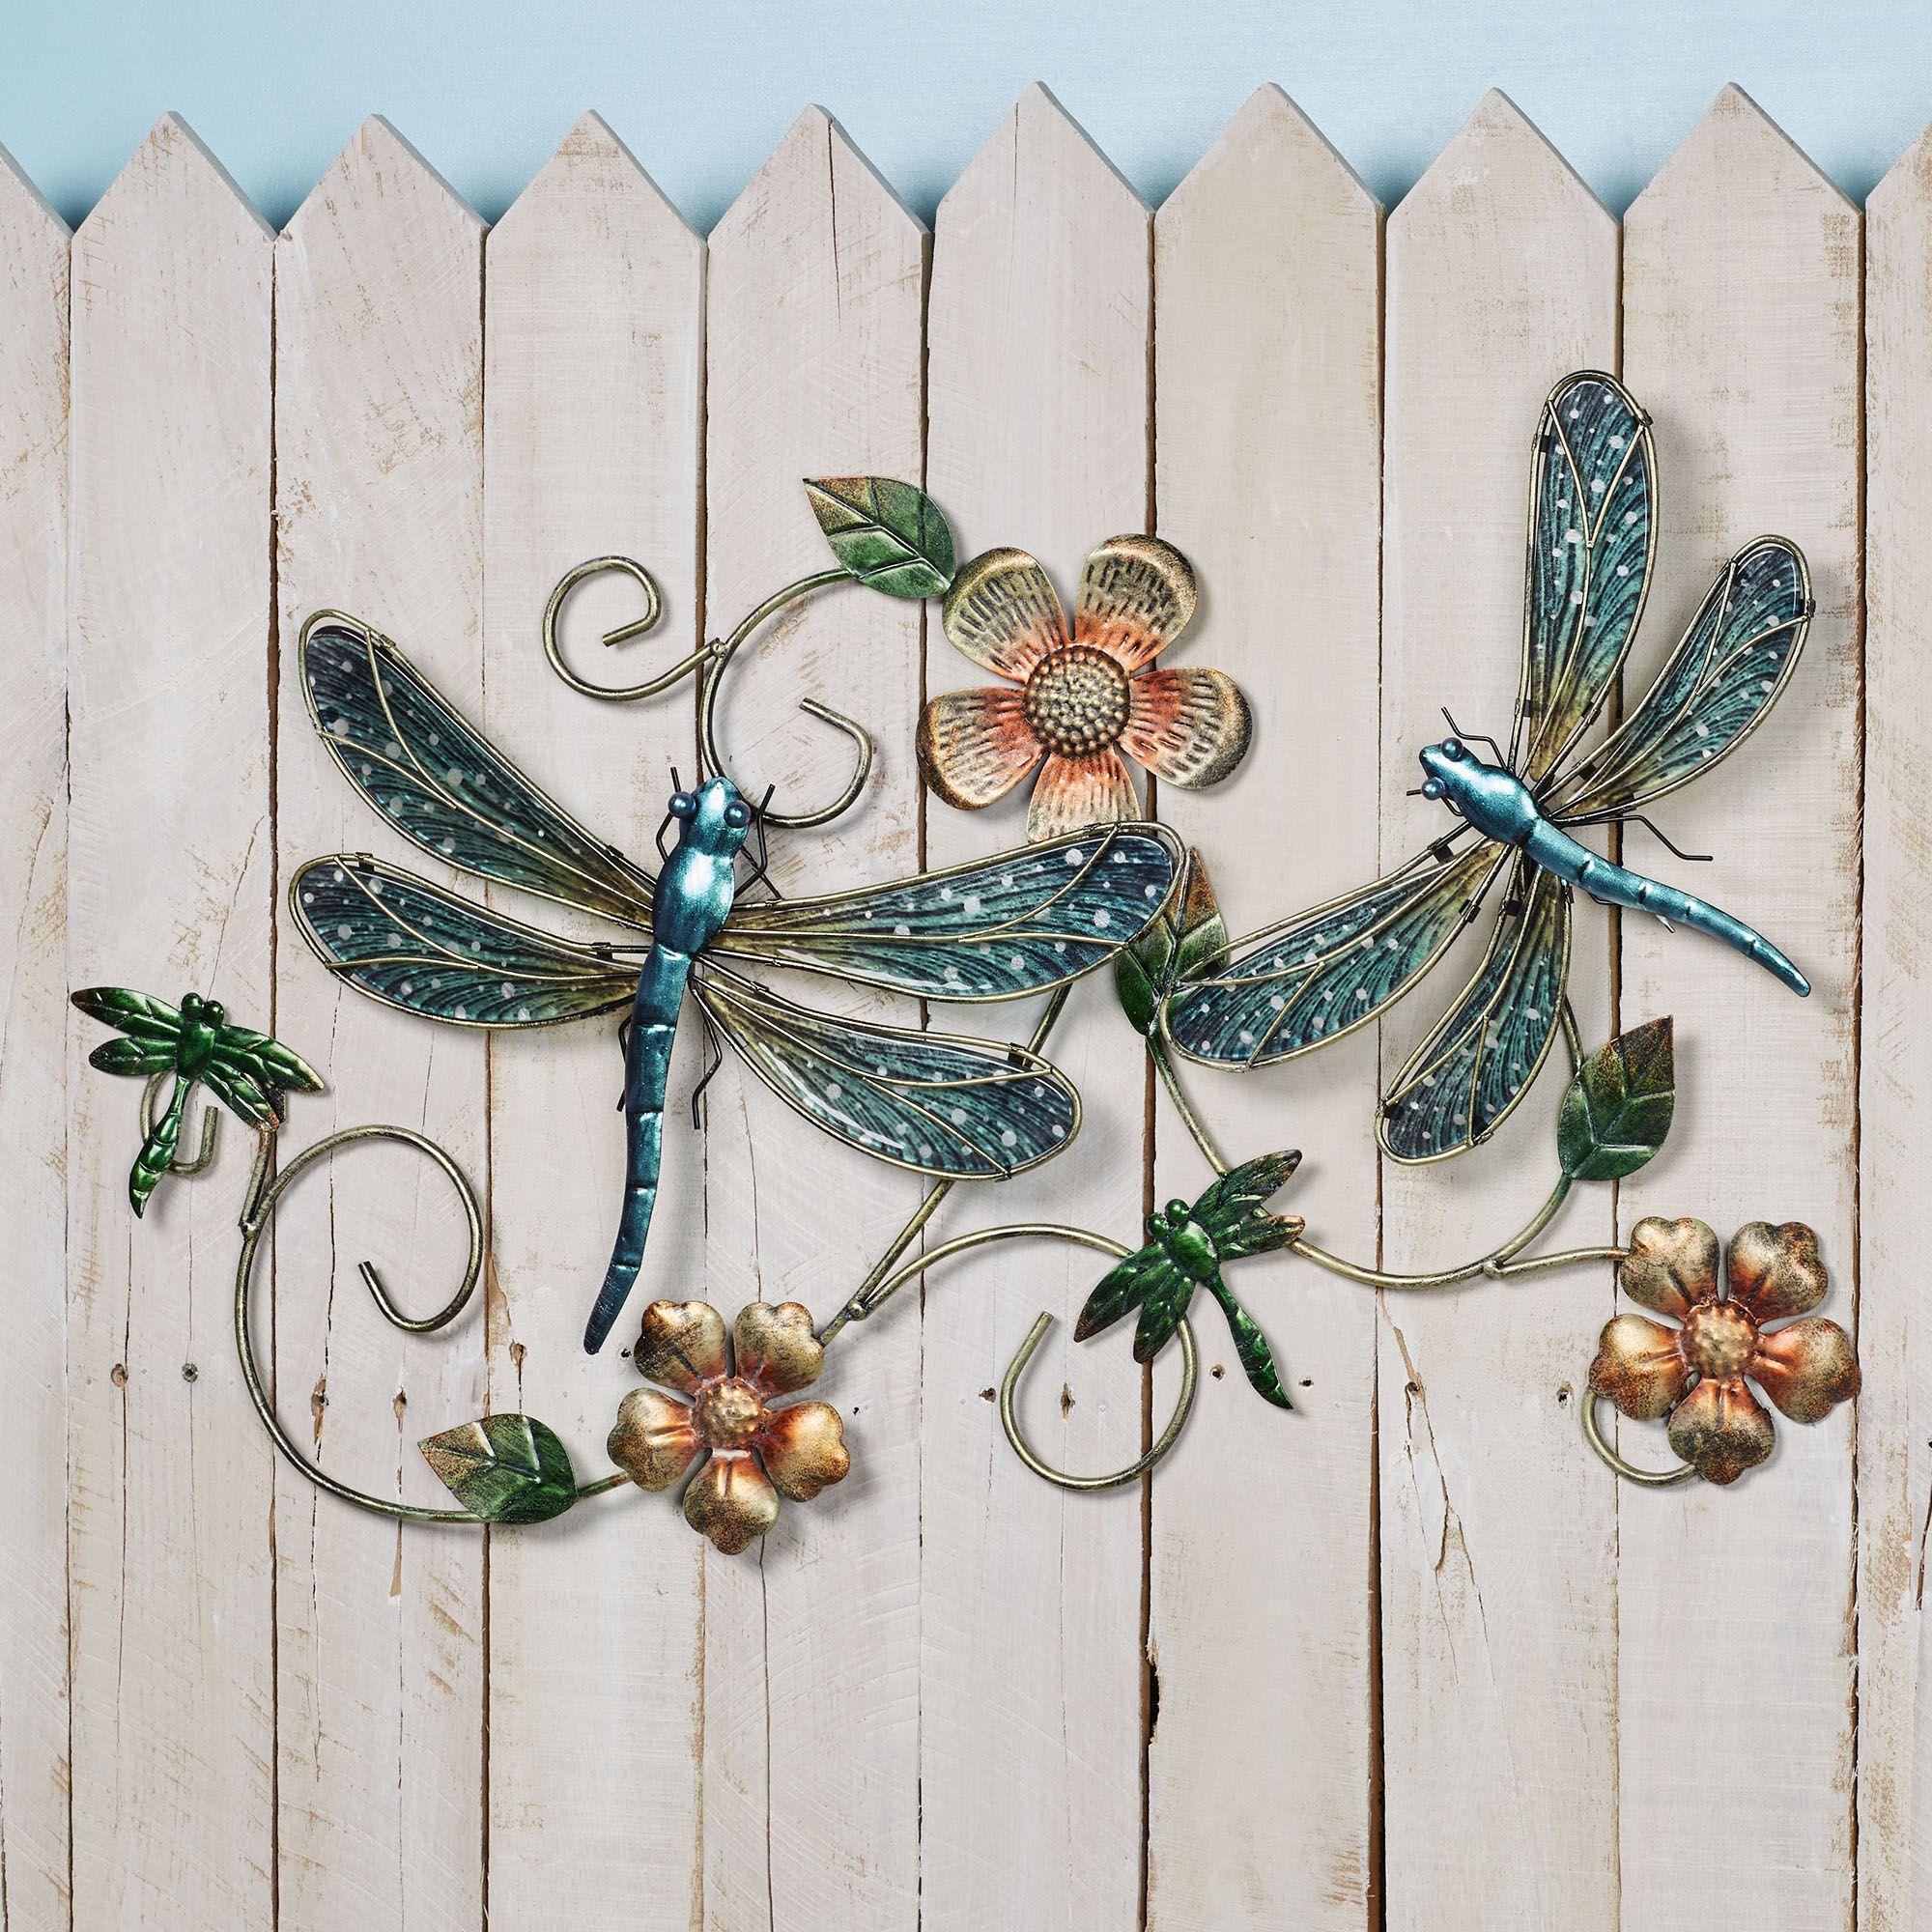 Johns Studio Metal Dragonfly Wall Decor, Dragonfly Bathroom Wall Decor